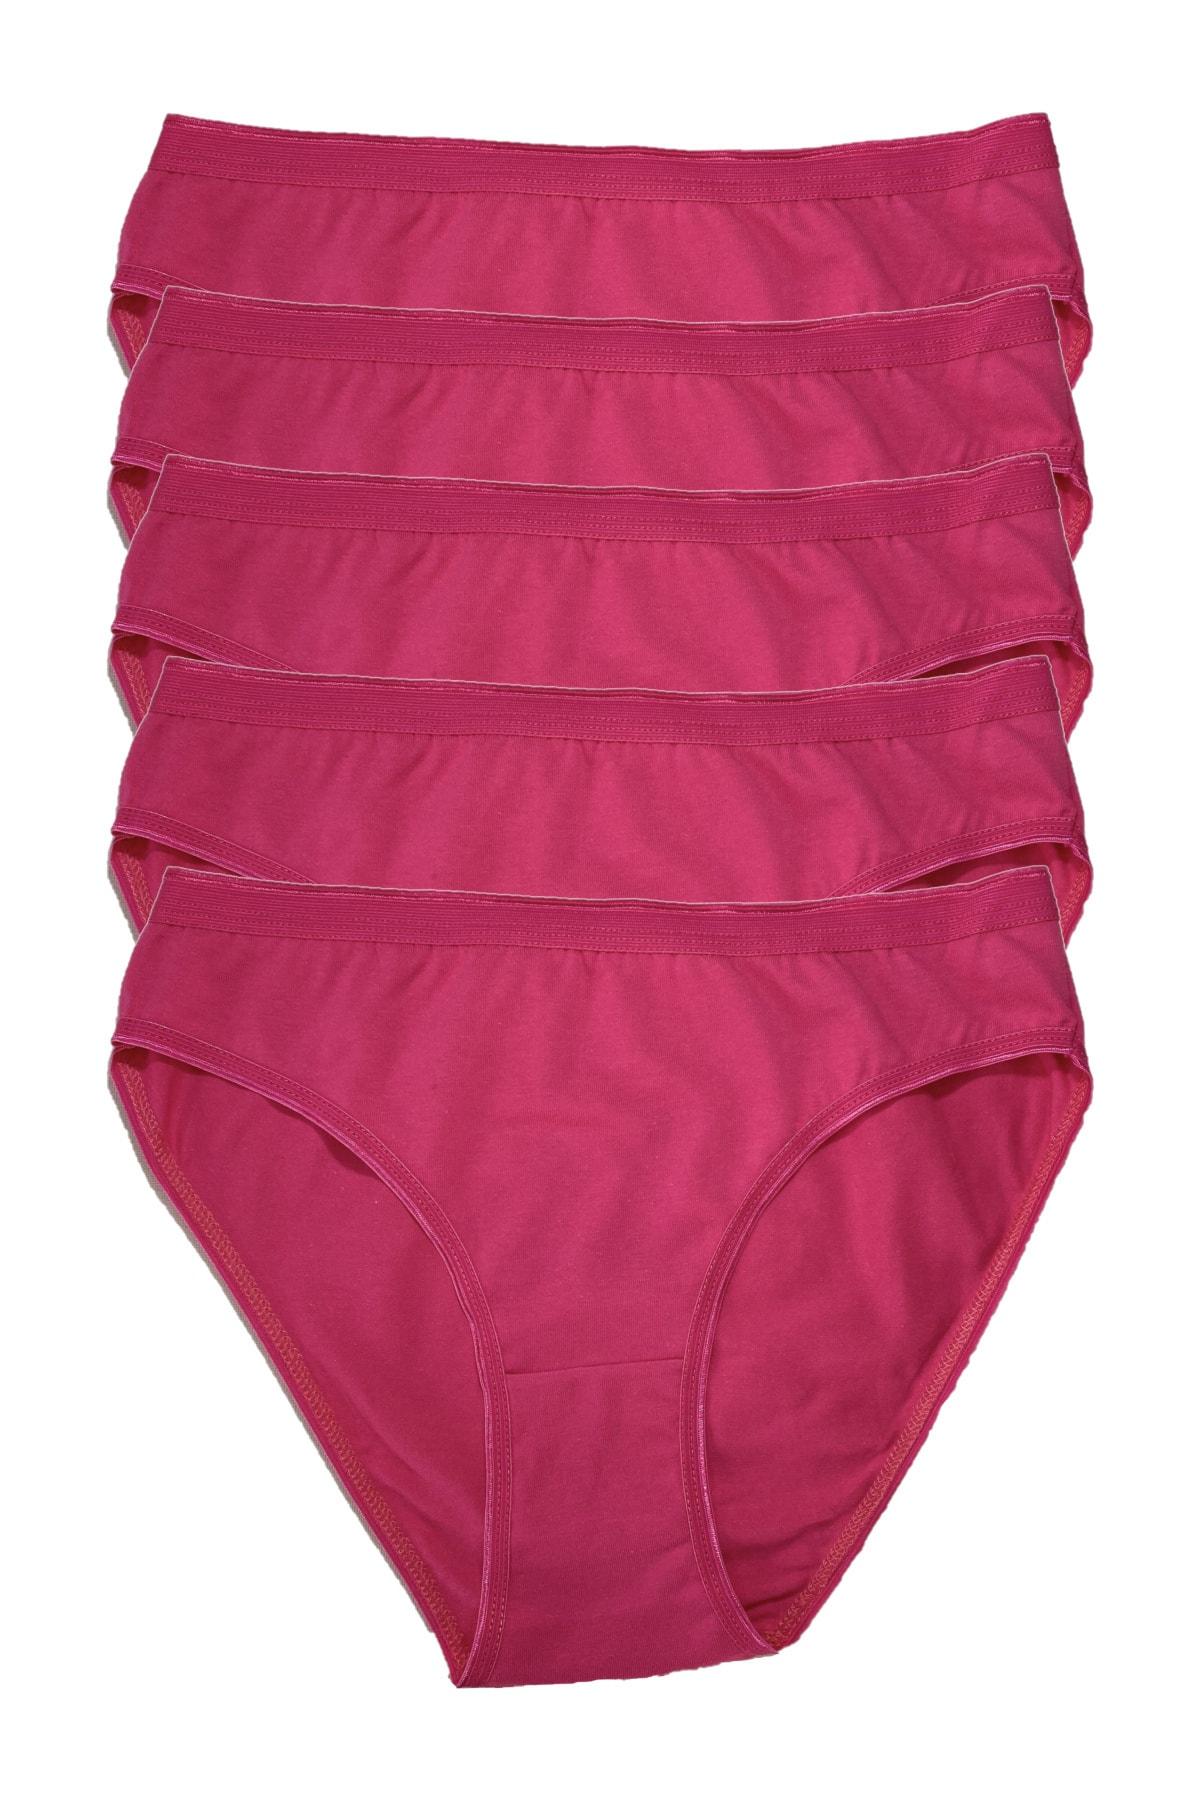 Tutku Kadın Penye Bikini 5li Külot Fuşya 1